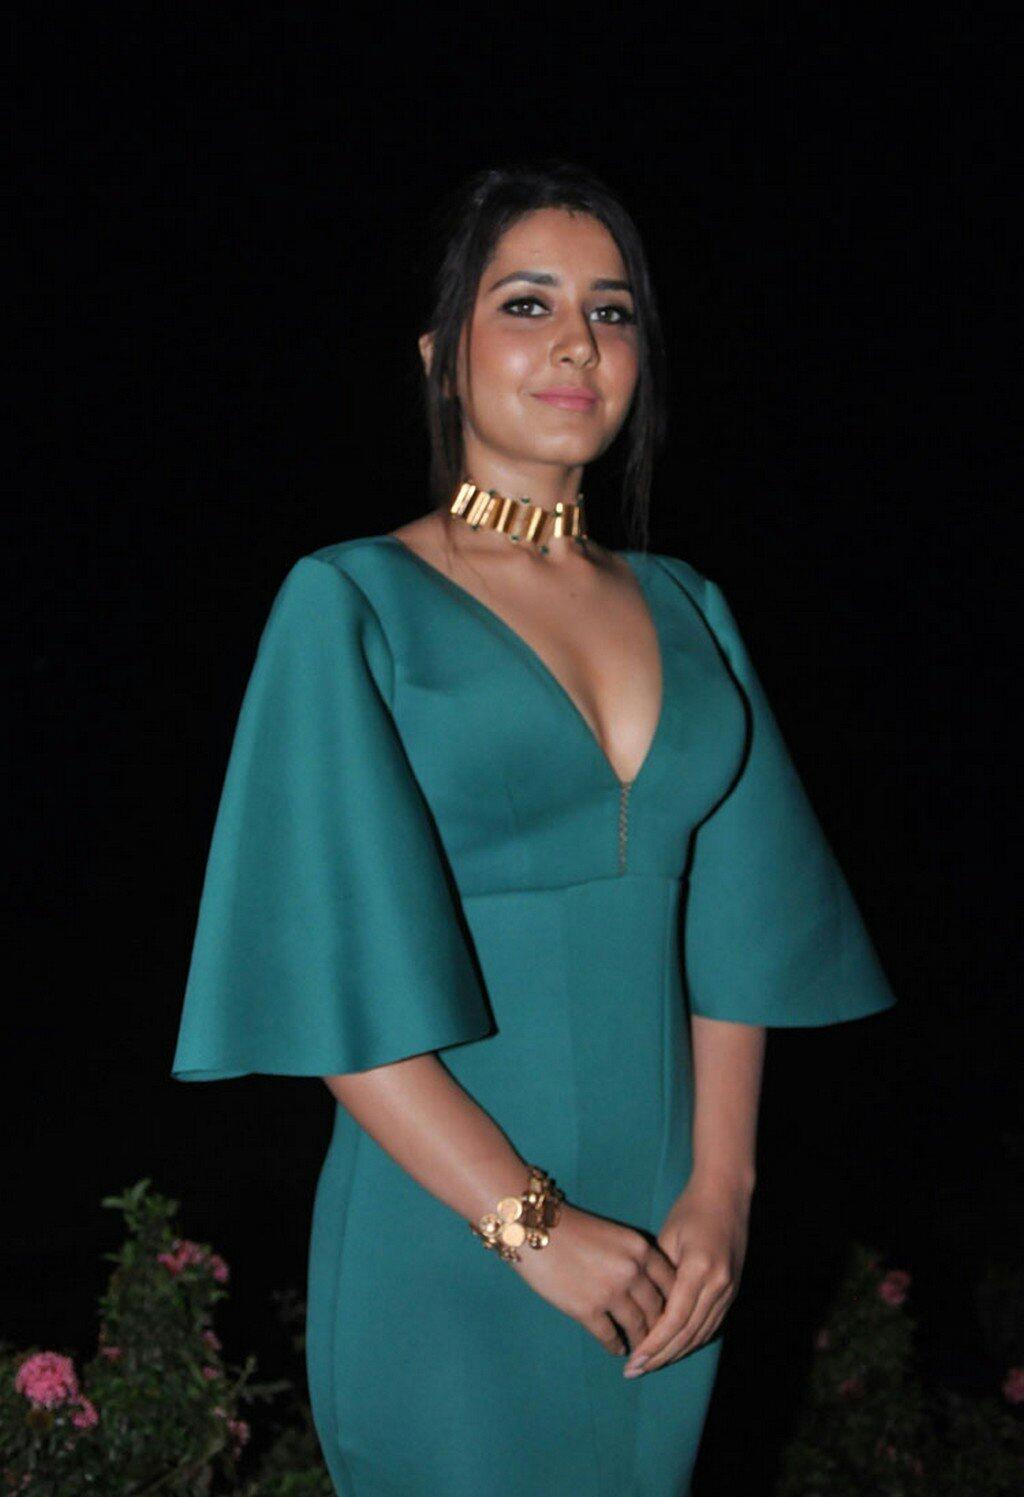 Rashi Khanna Sexy Deep Cleavage At Hyper Trailer Launch 1 1 - Rashi Khanna Sexiest Cleavage Pictures Collection-Hot HD Photos